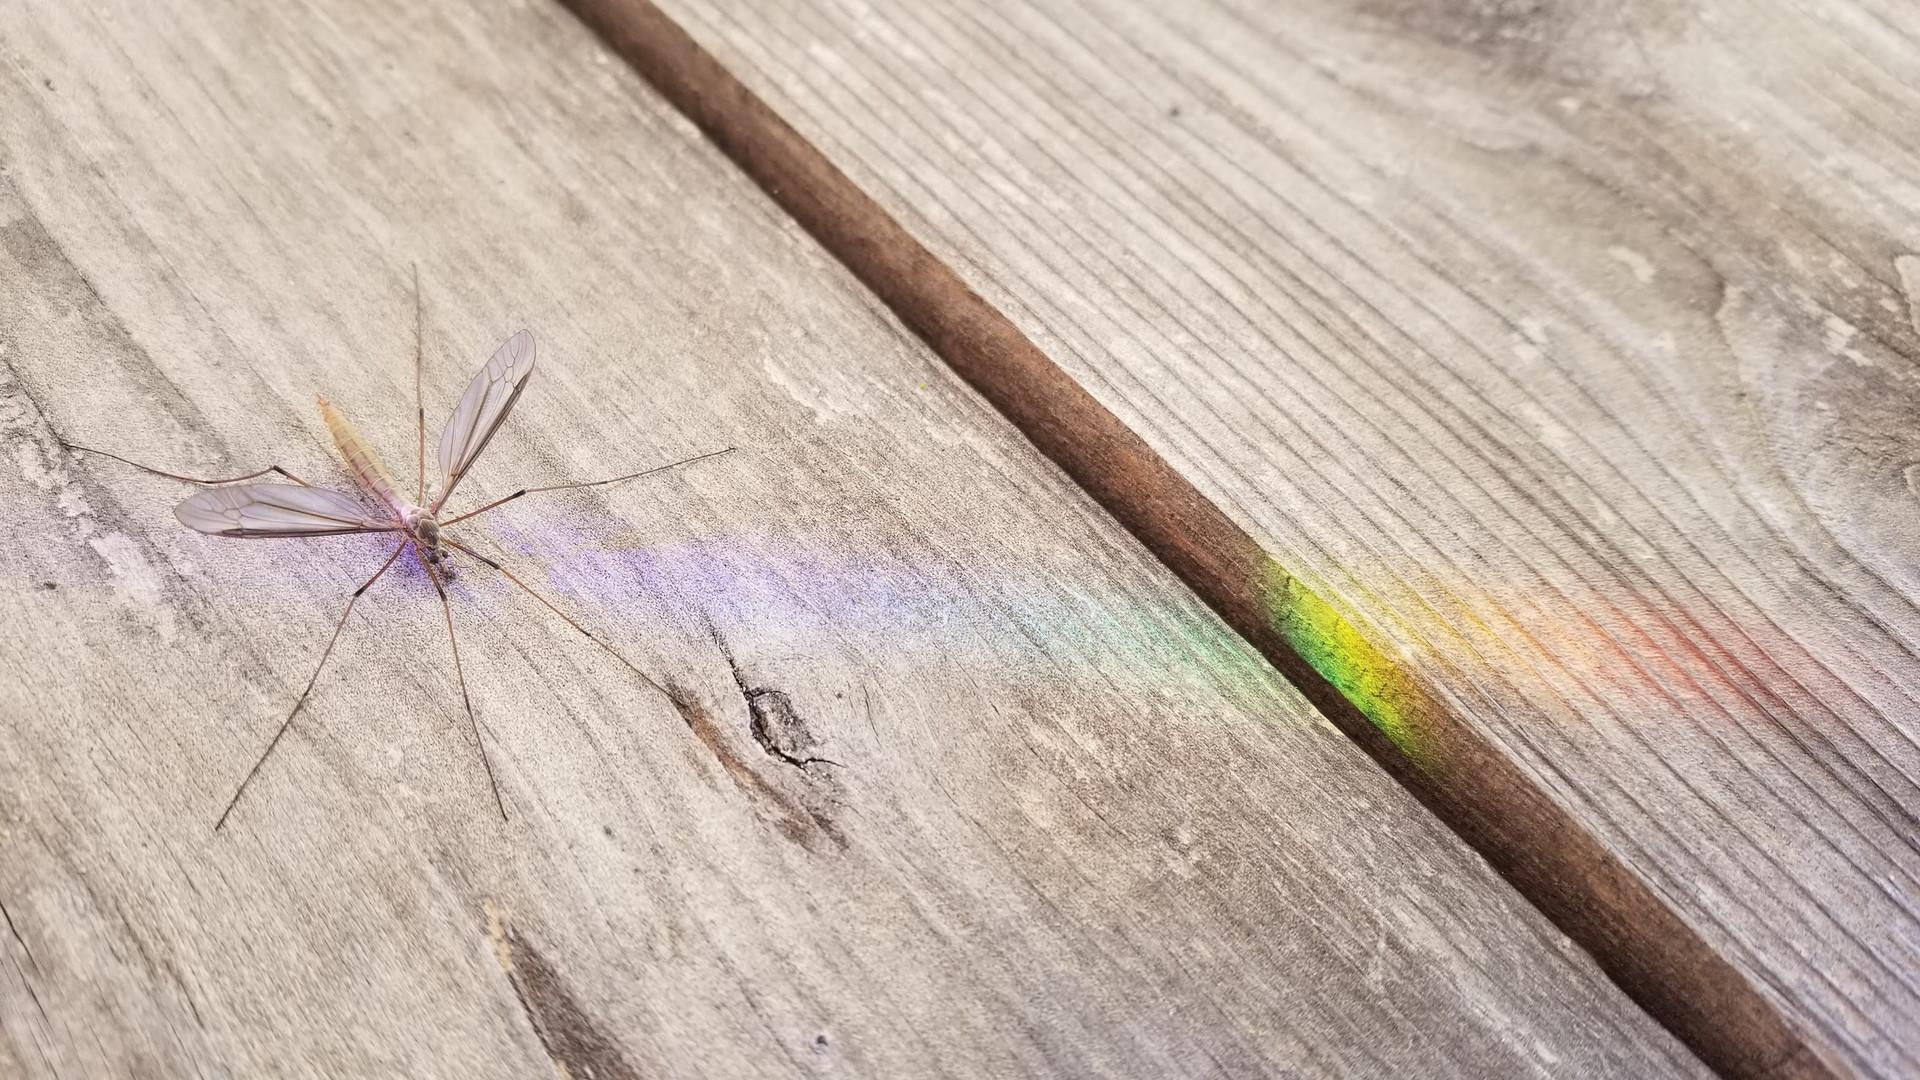 cranefly.jpg